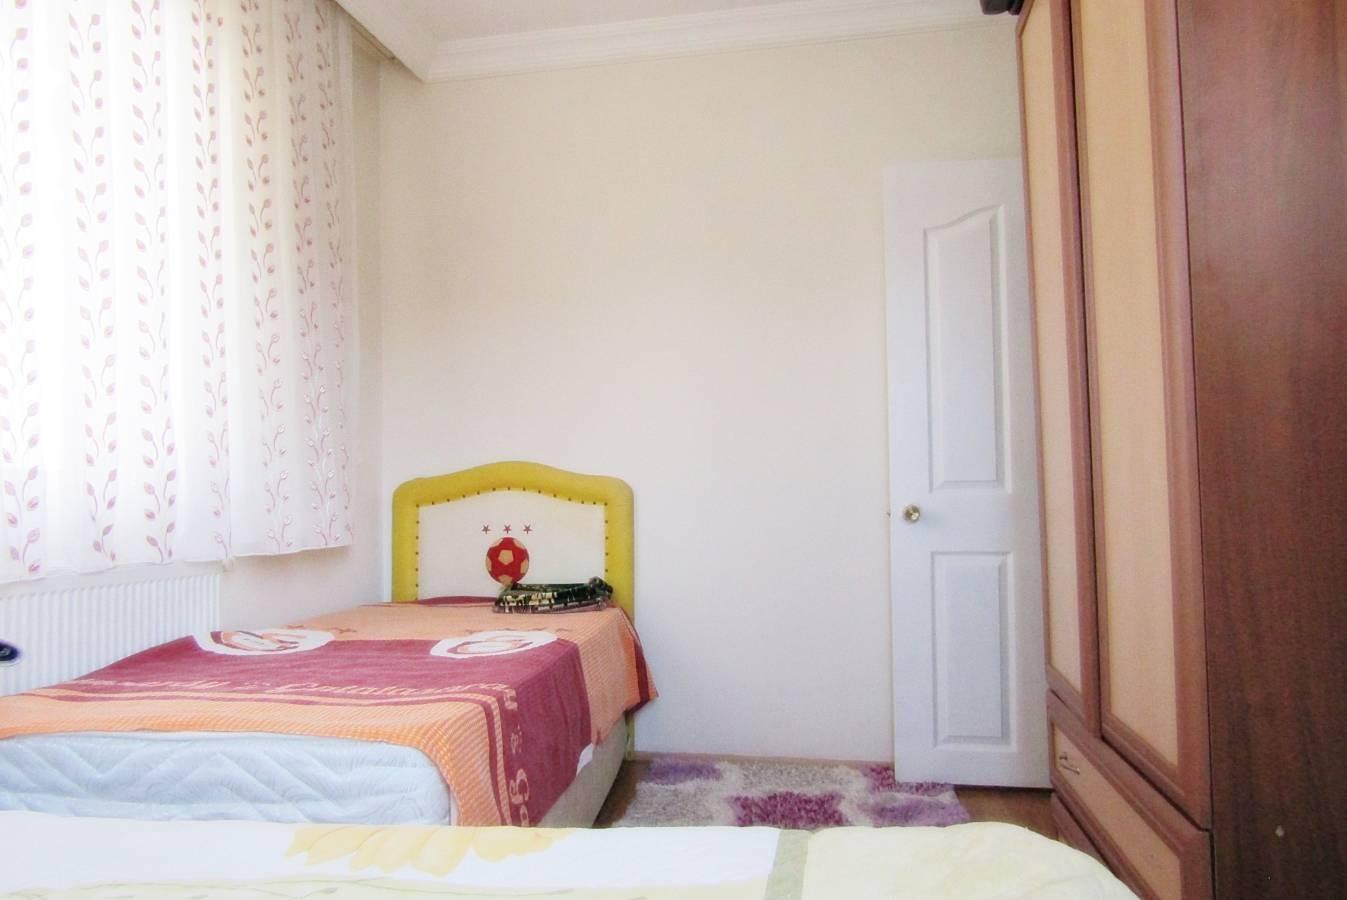 SR EMLAK'TAN PİYADE MAH'DE 4+2 230 m²  ÖN CEPHE MANTOLAMALI DAİRE